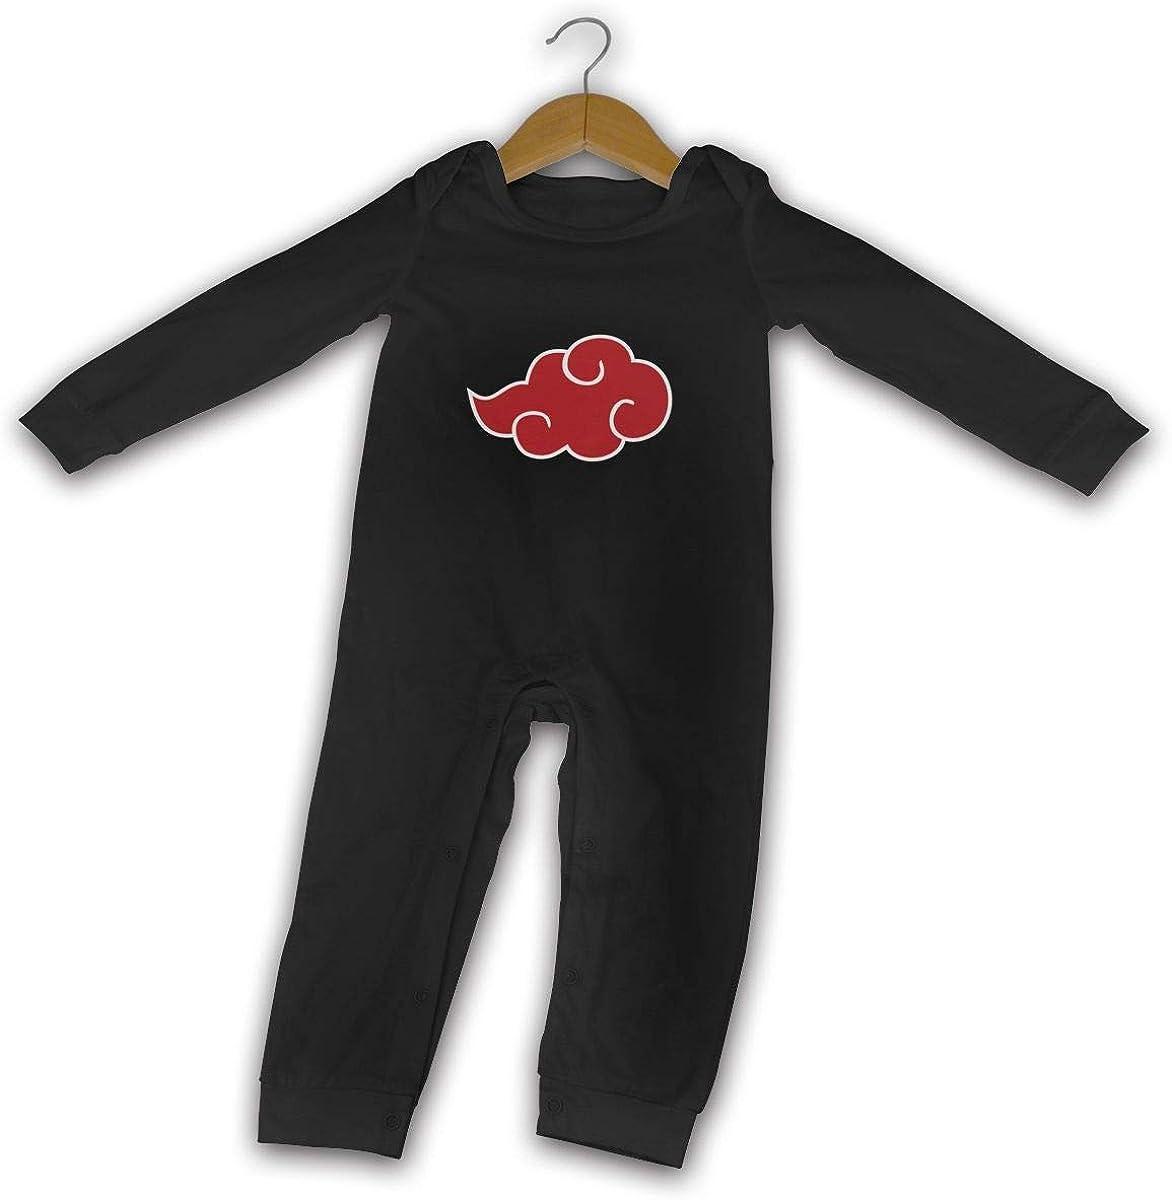 GongCZL Designed Naruto Sign T Shirts for Baby Boys Girls Black